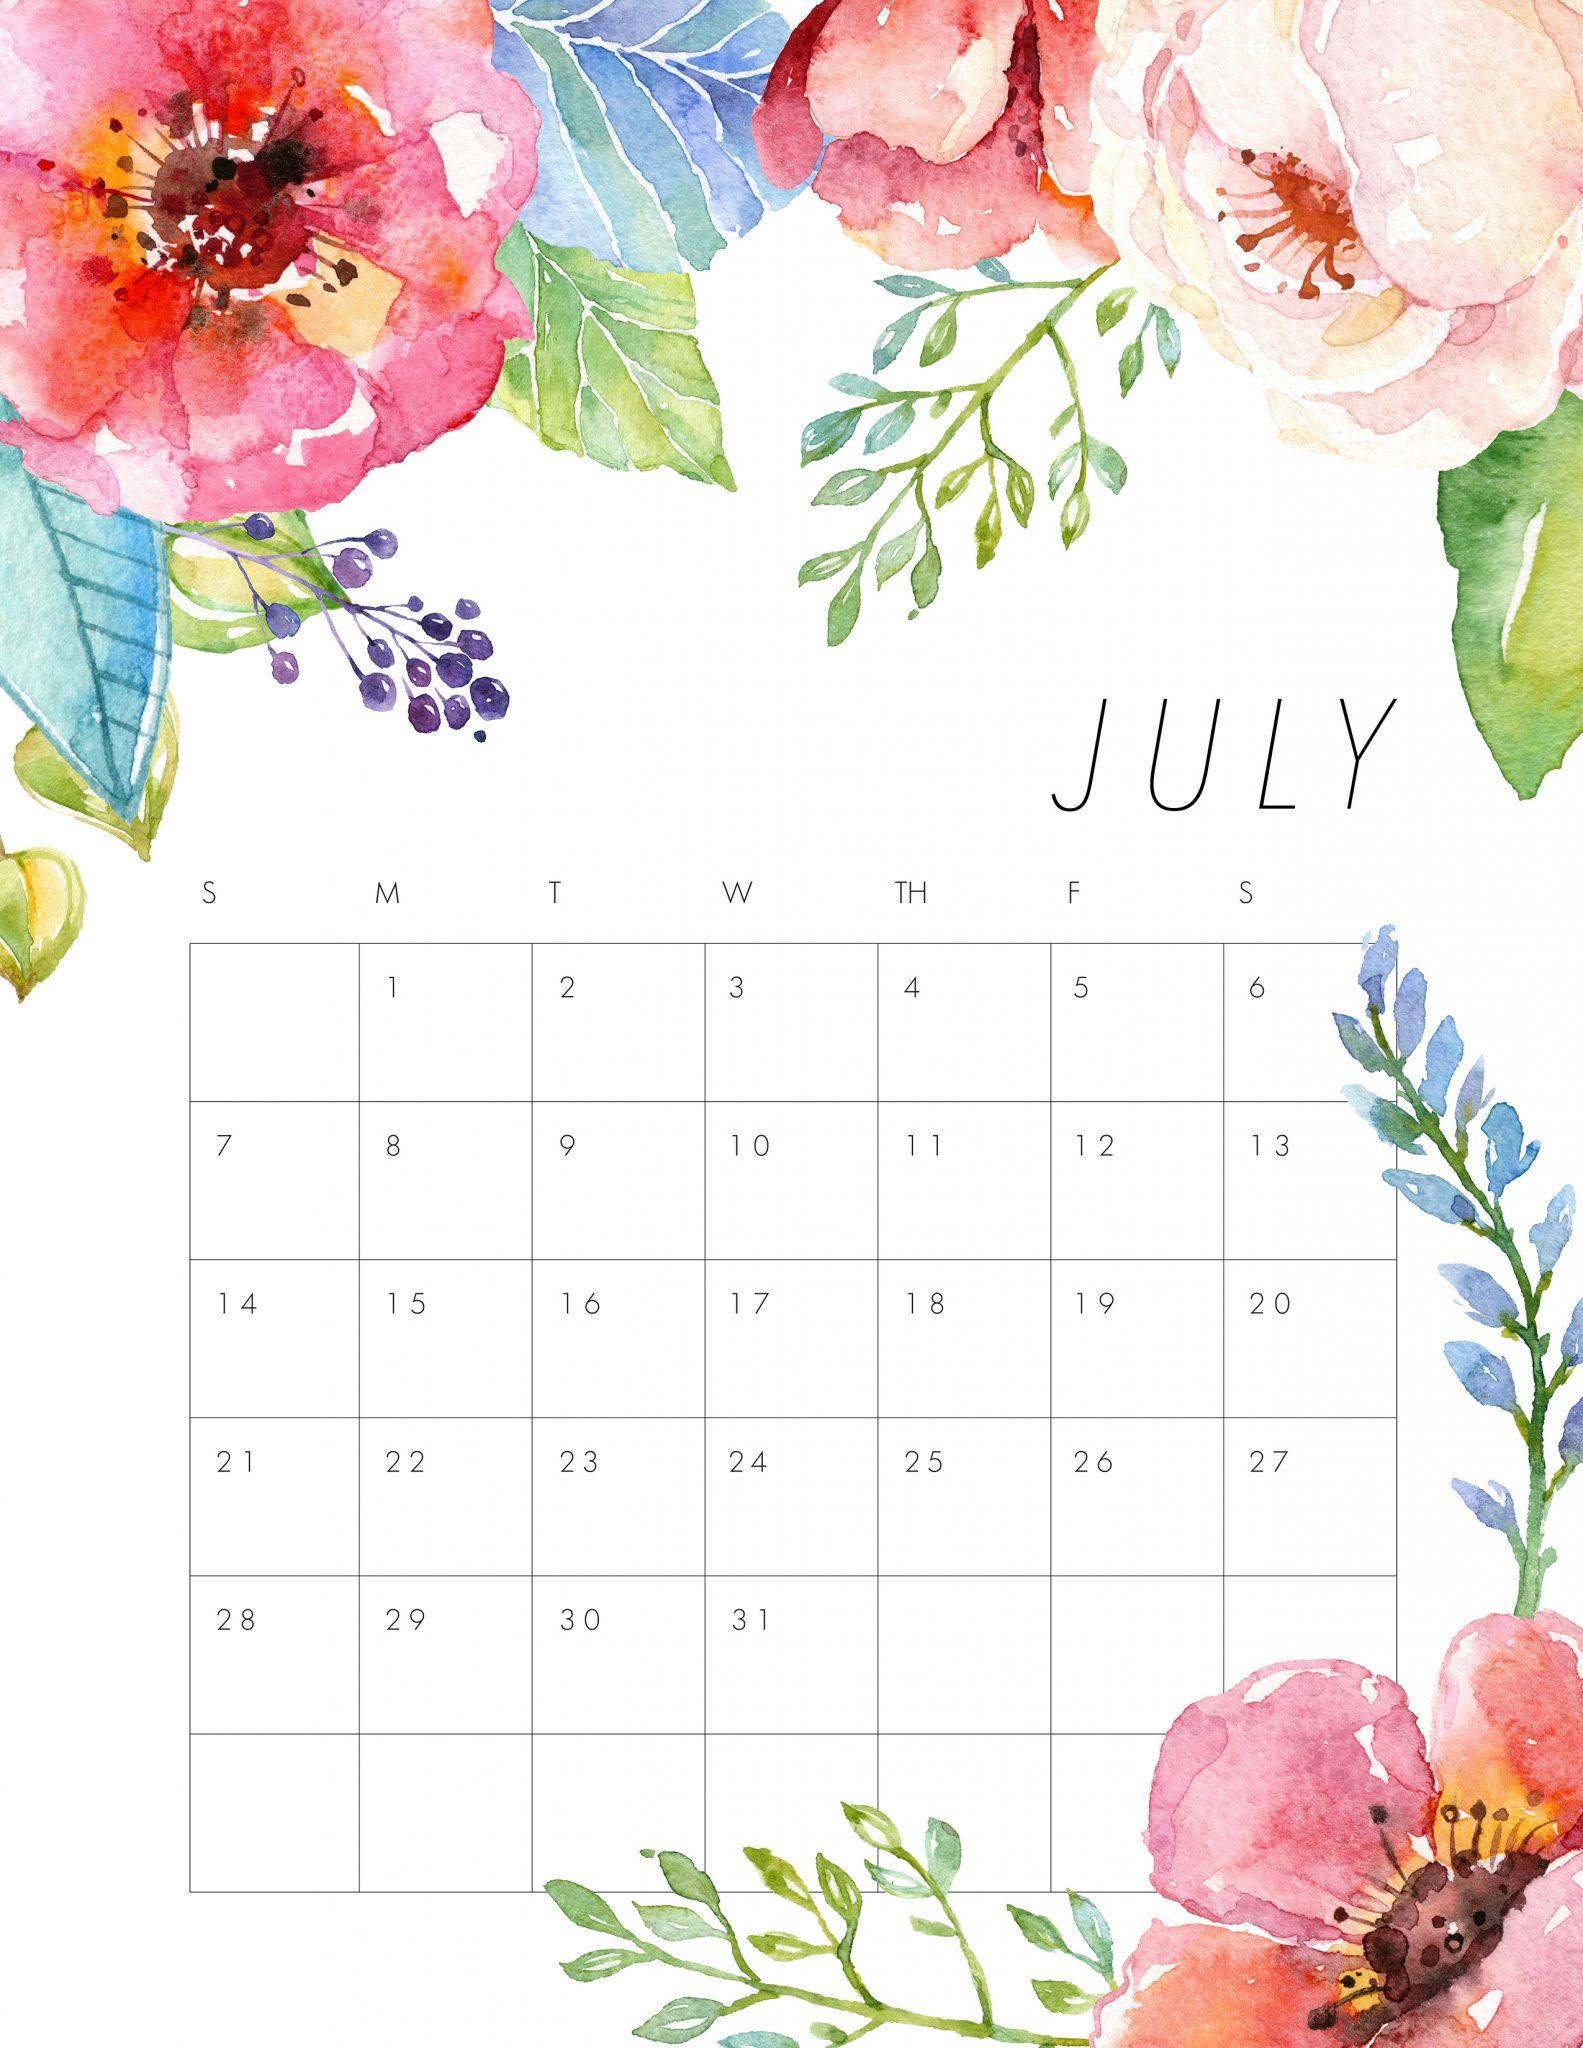 Floral July Calendar Printable Template - Free Printable